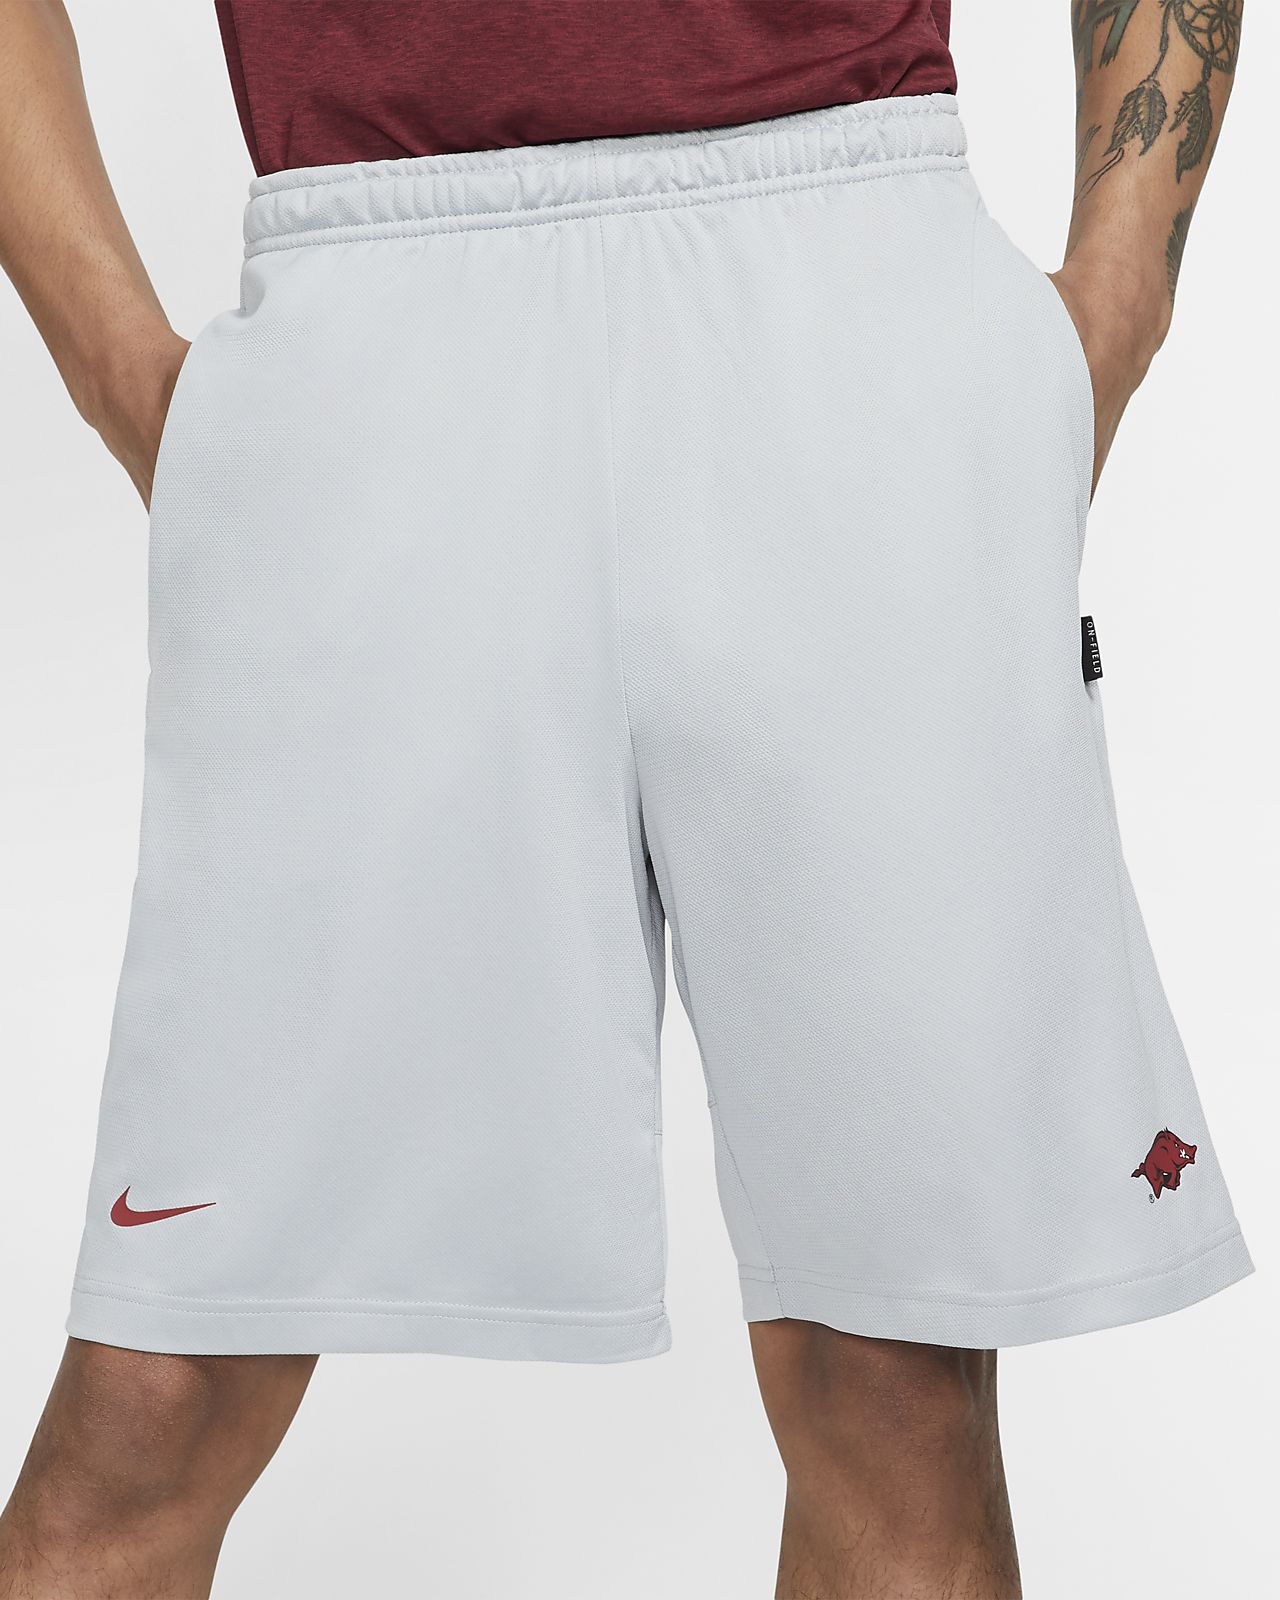 Nike College Dri-FIT Coach (Arkansas) Men's Shorts